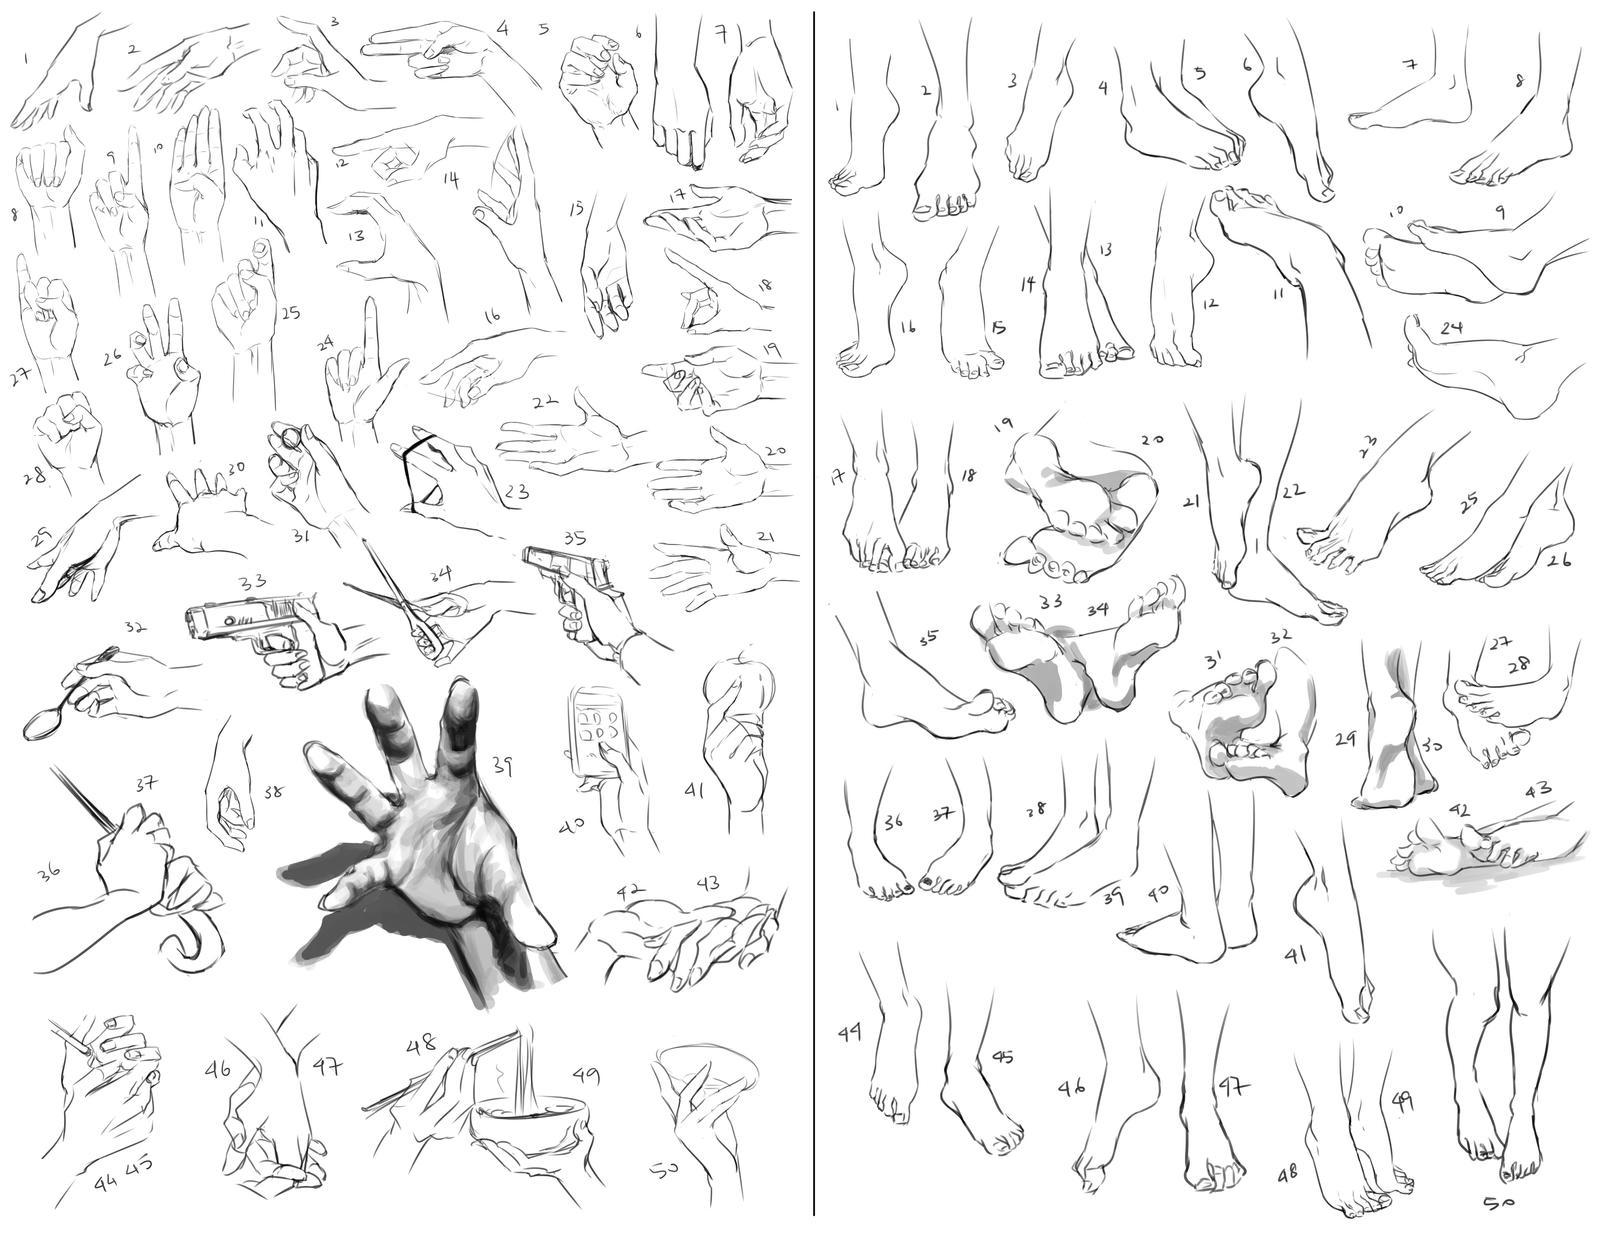 50 Hands and 50 Feet Challenge by kayoru